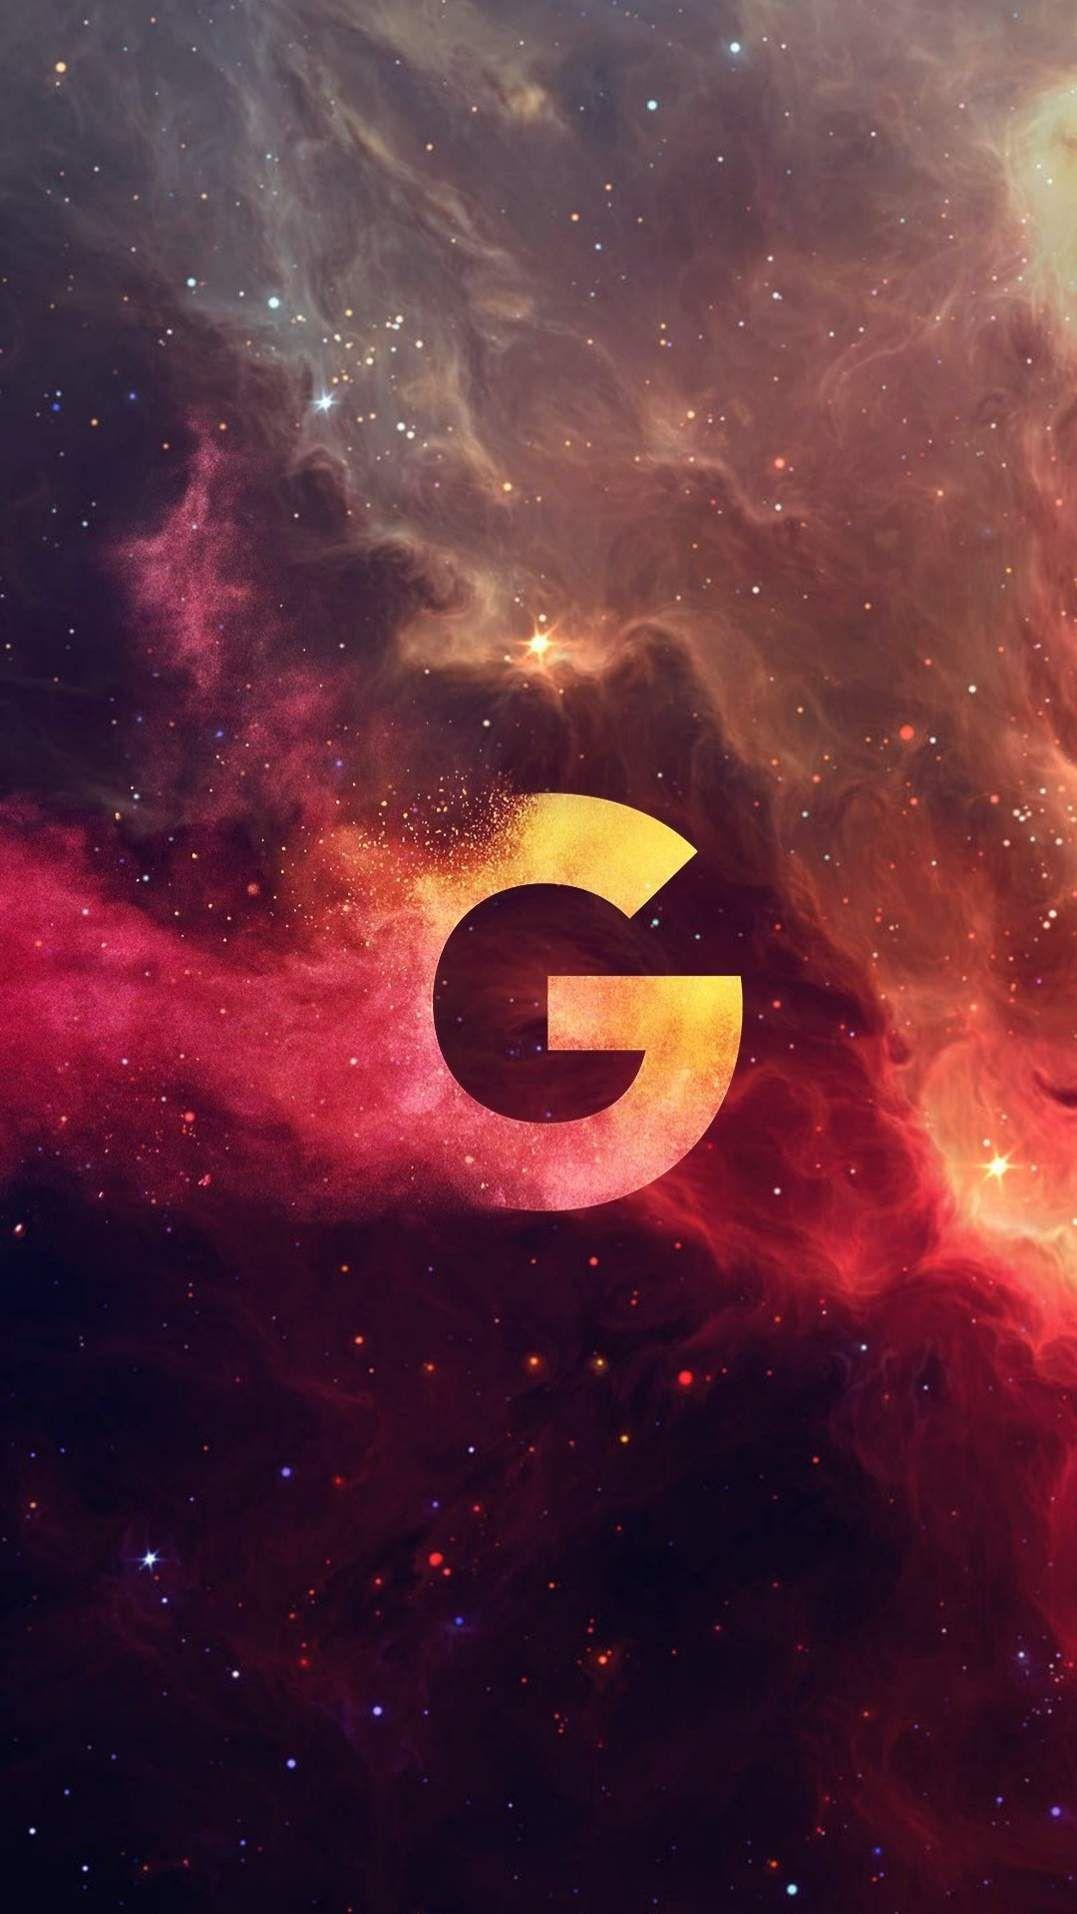 Google Pixel Wallpaper Image By Miguel Angel Del West On